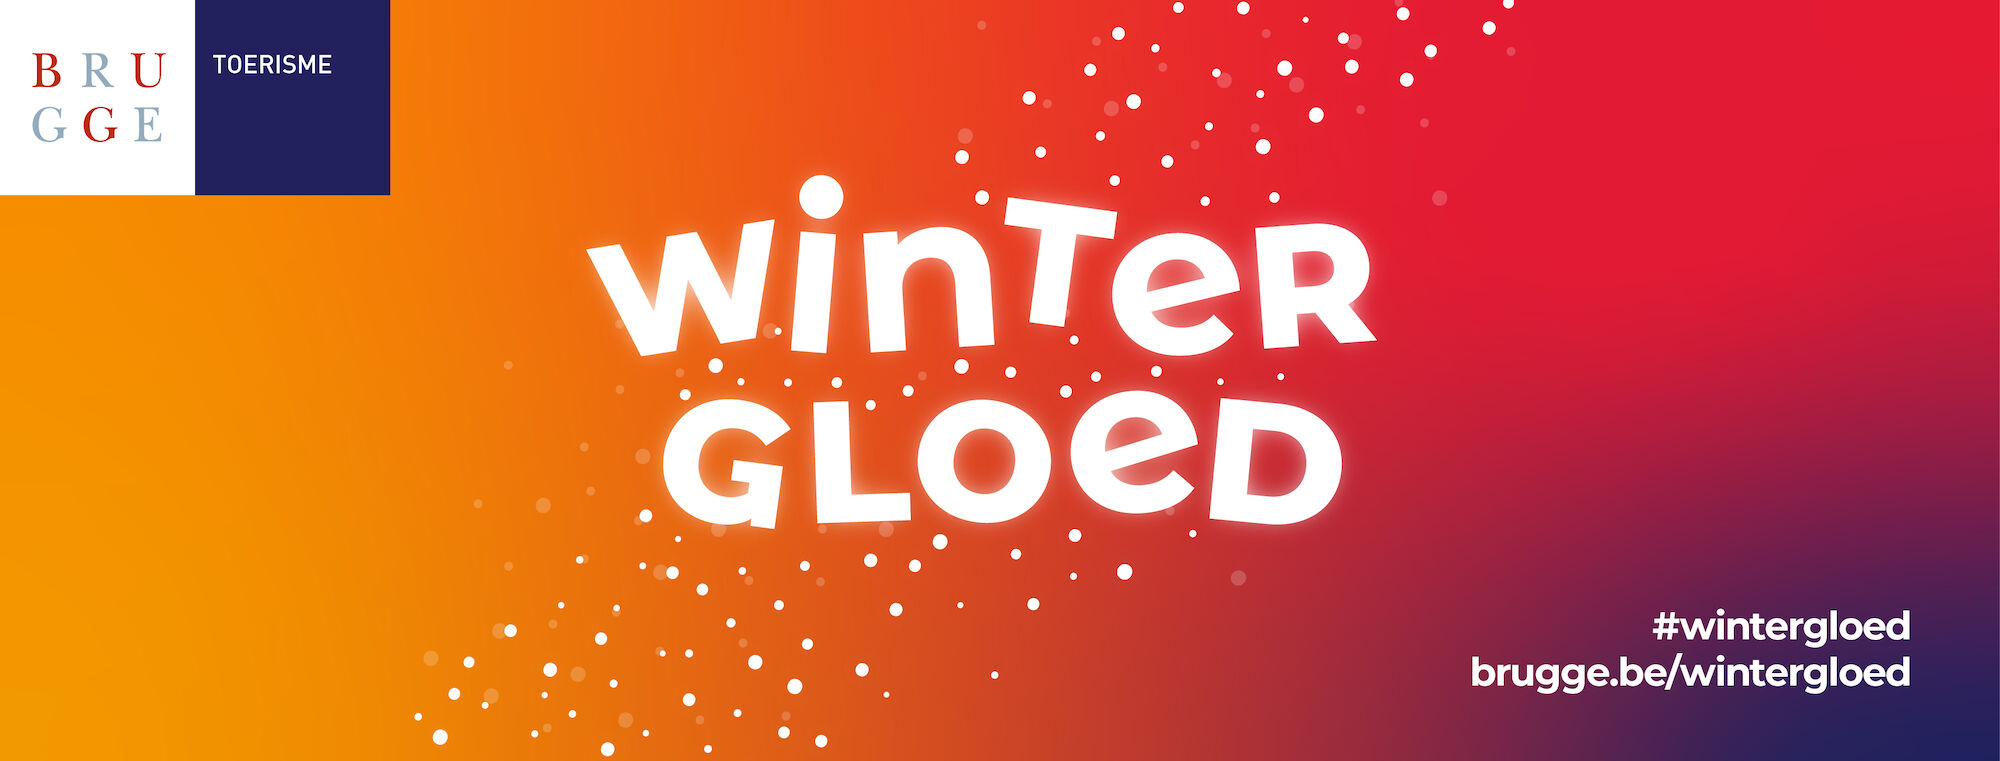 Wintergloed banner facebook